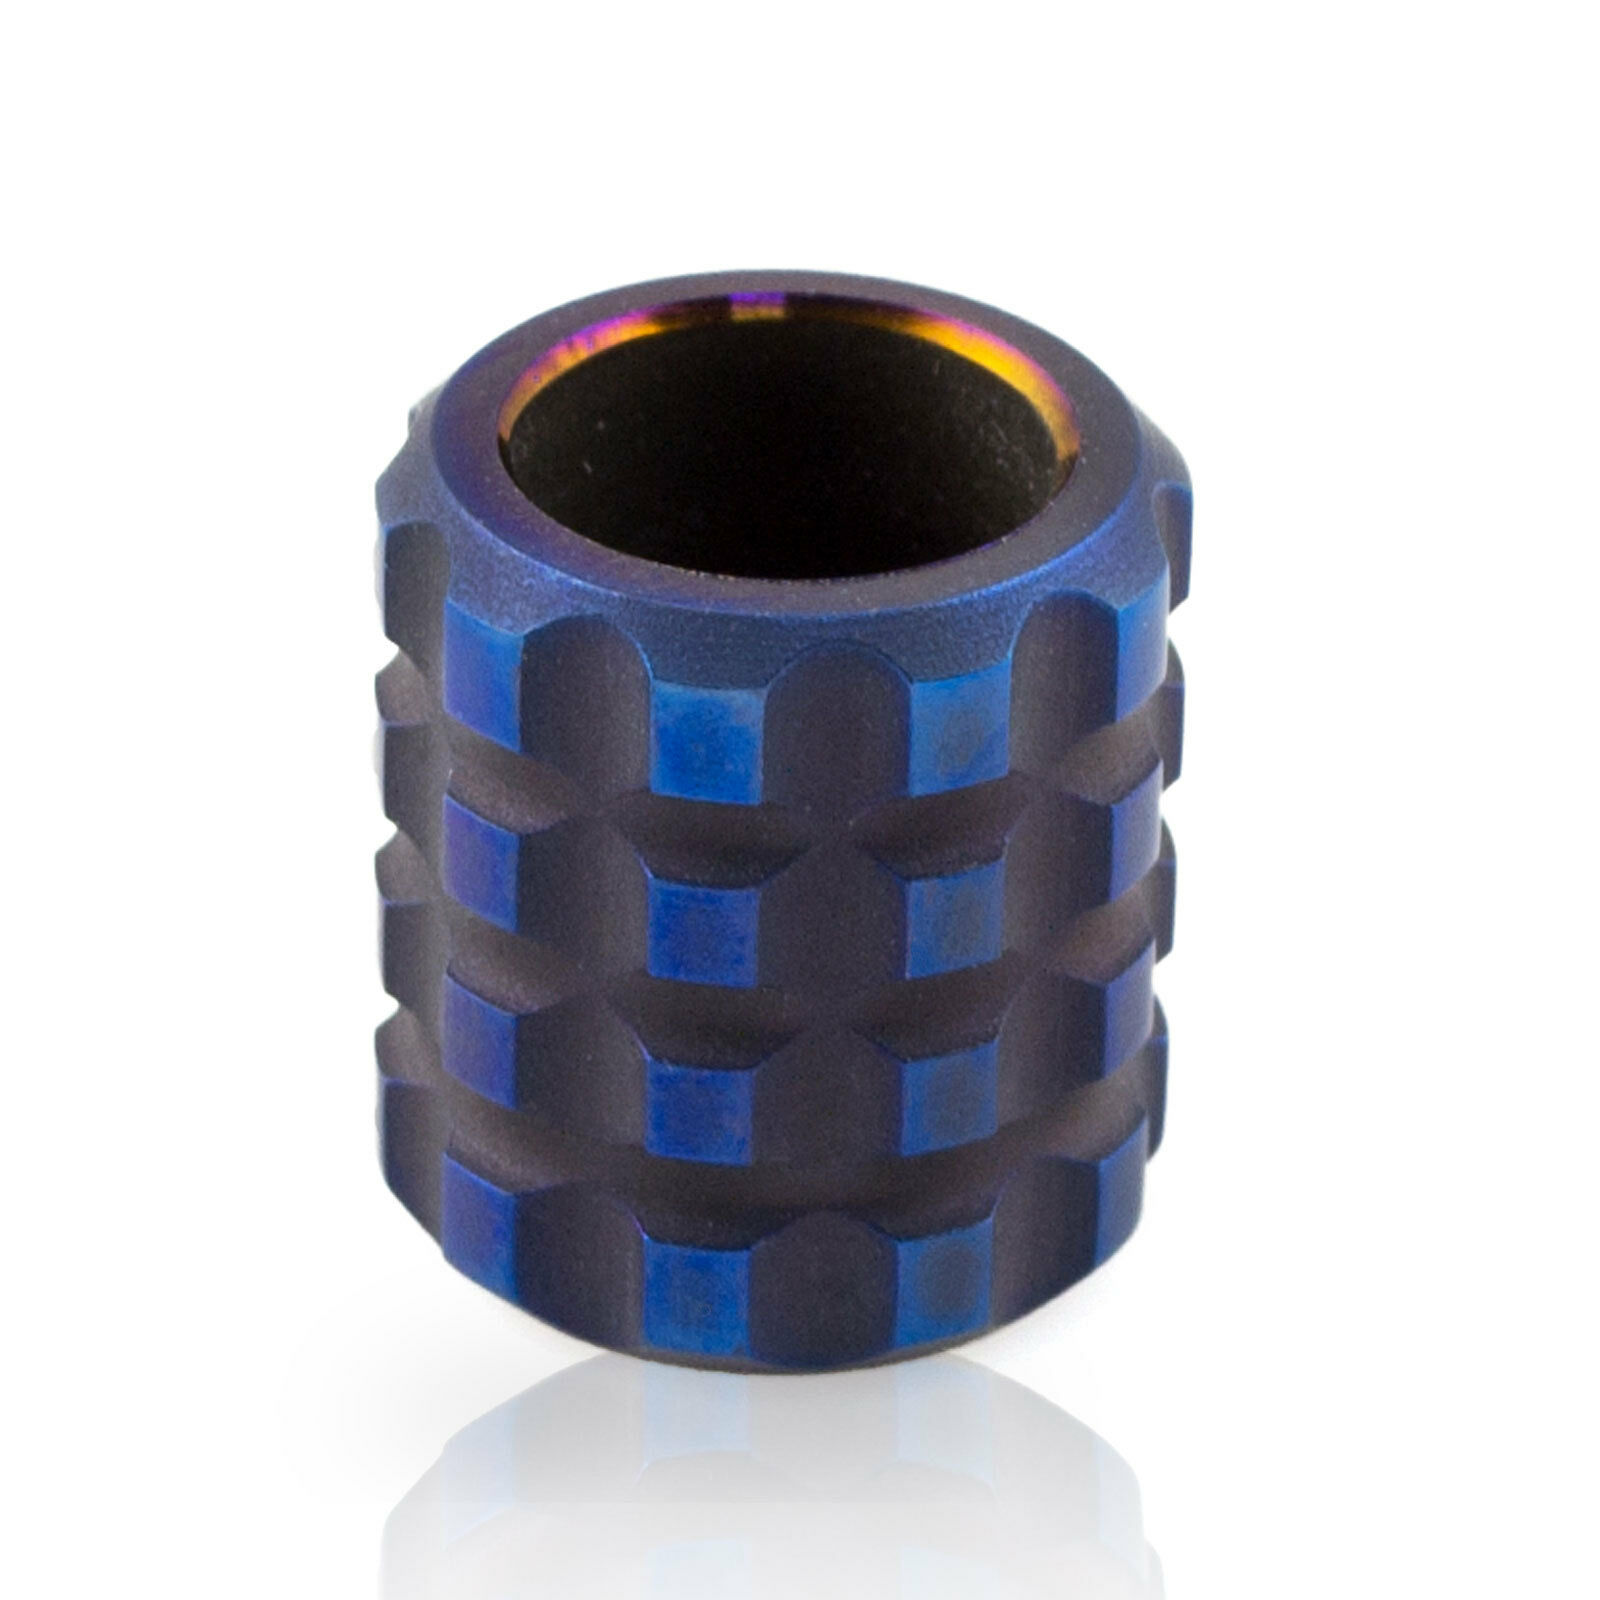 Cool Round Paracord Titanium Bead for Making Custom EDC Stuff Flashlight Lanyard